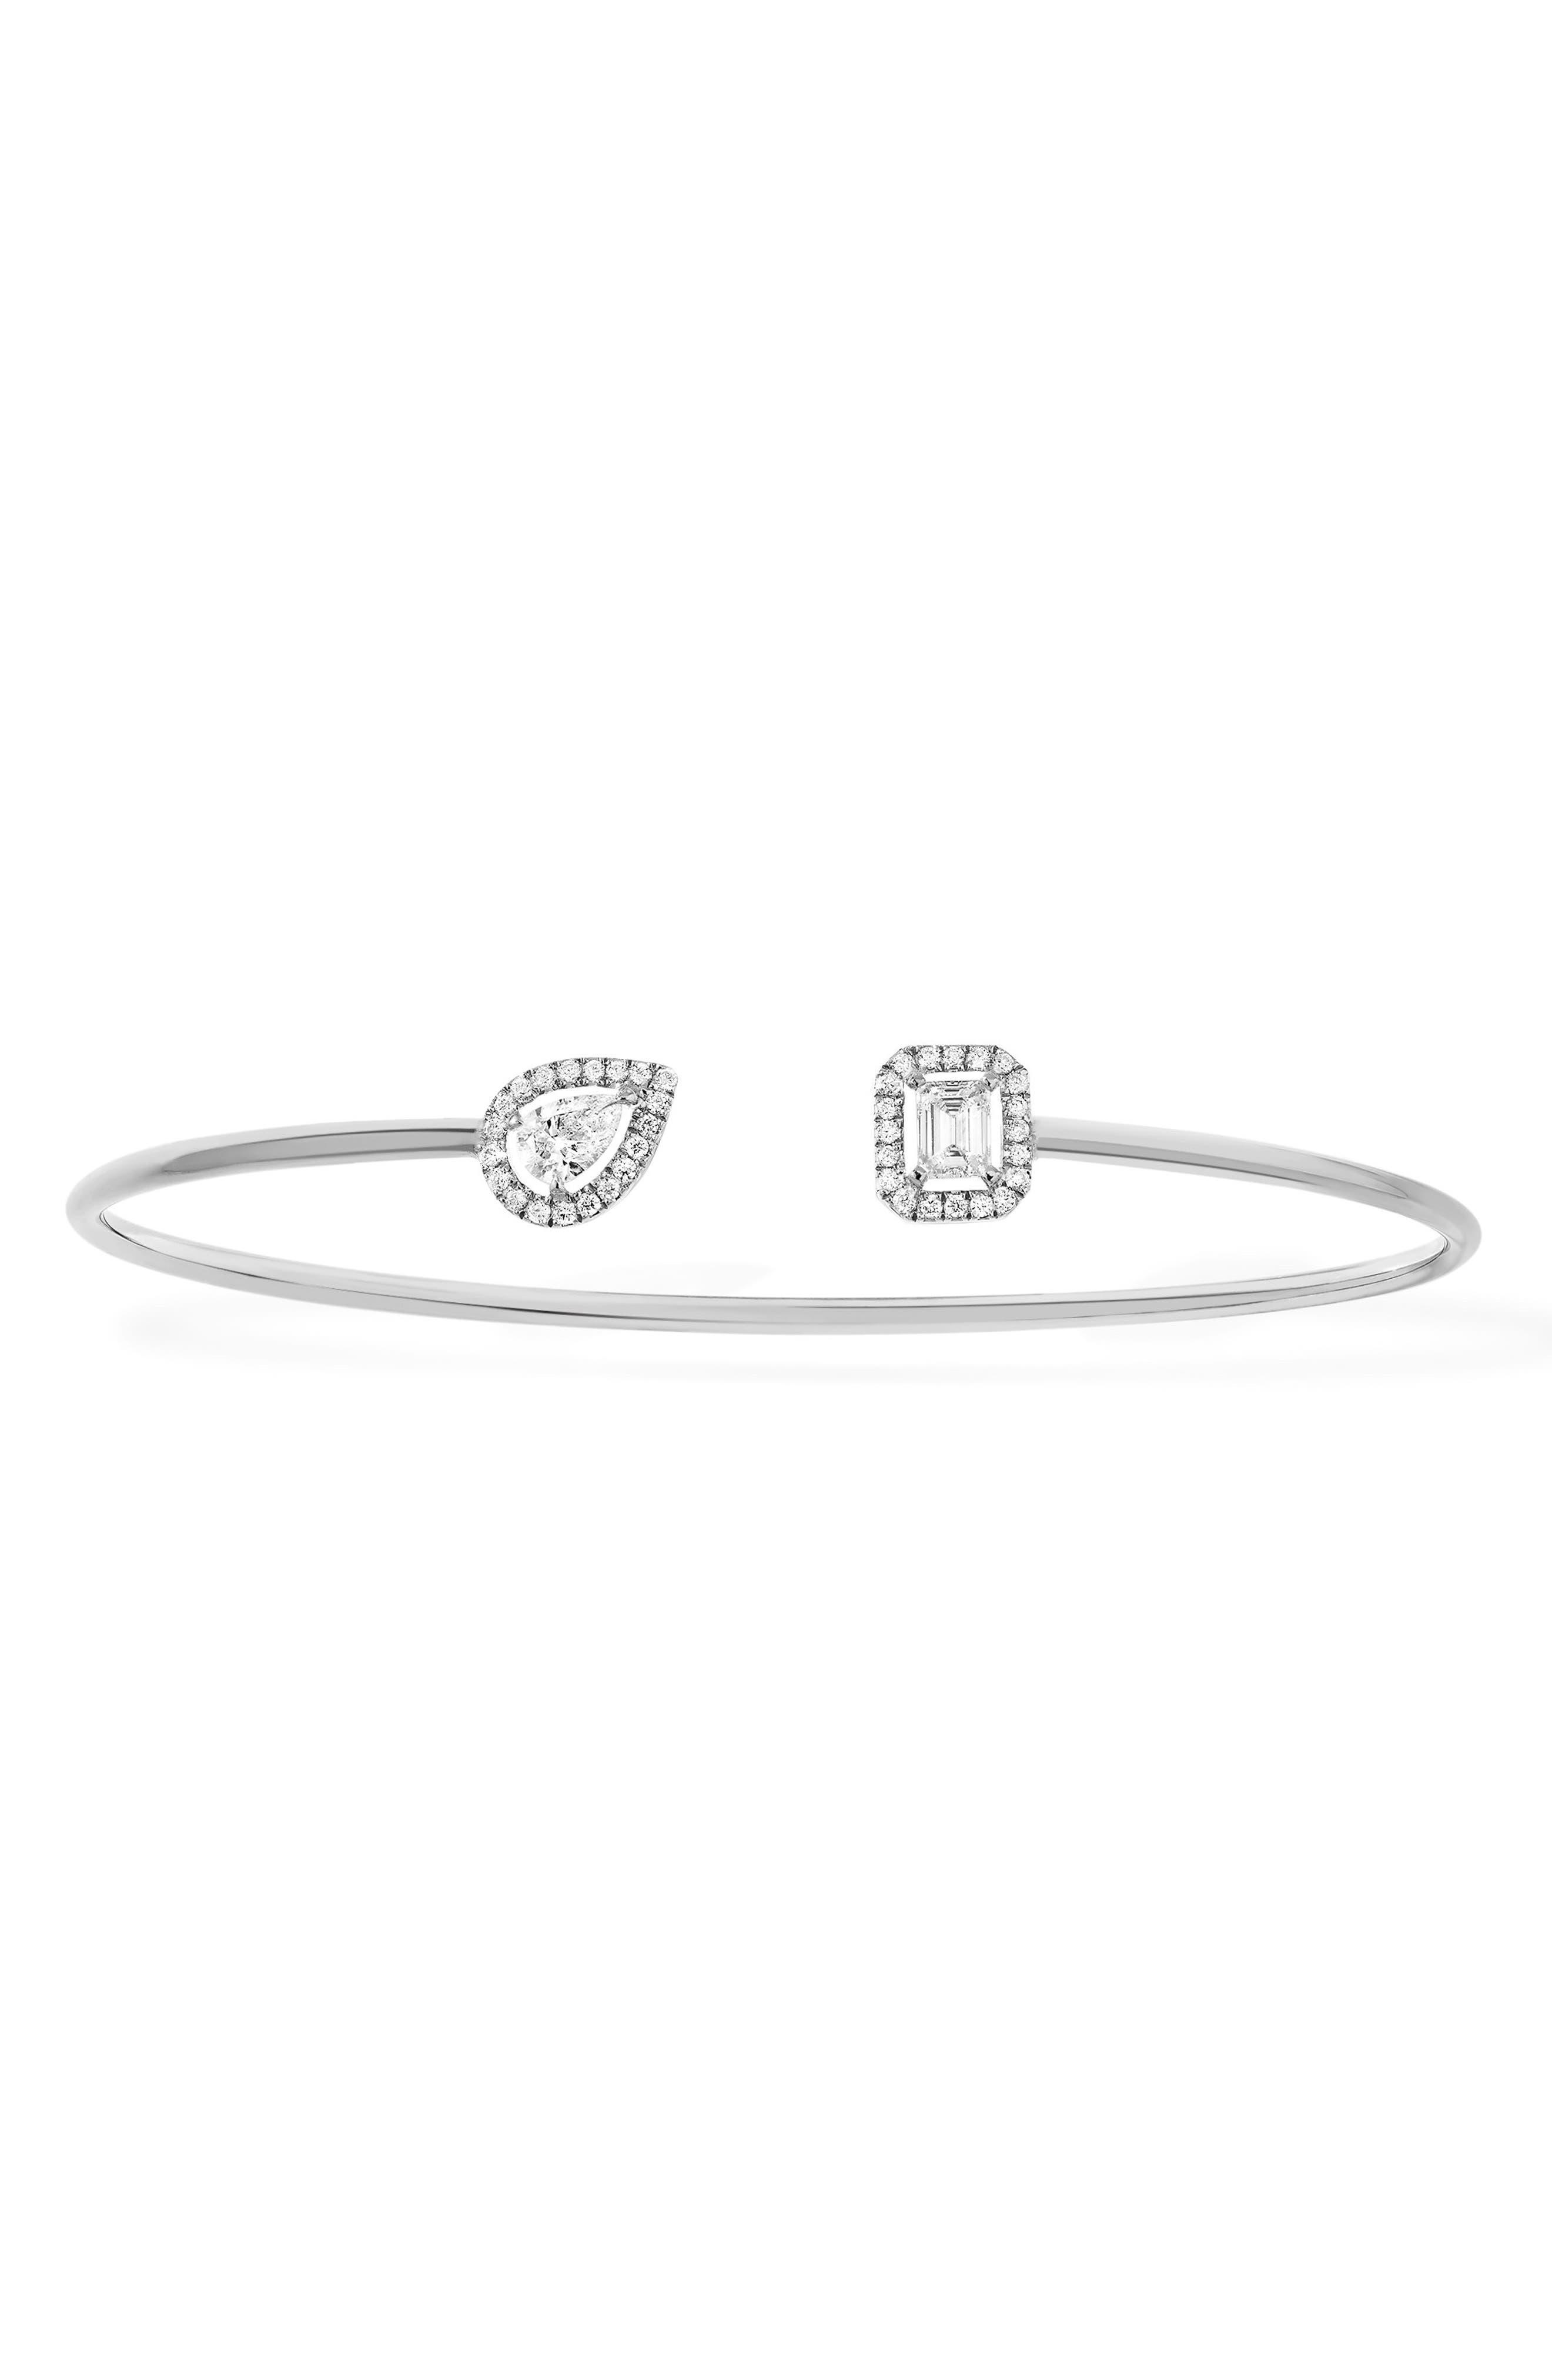 MESSIKA My Twin Memoire Open Diamond Cuff Bracelet in White Gold